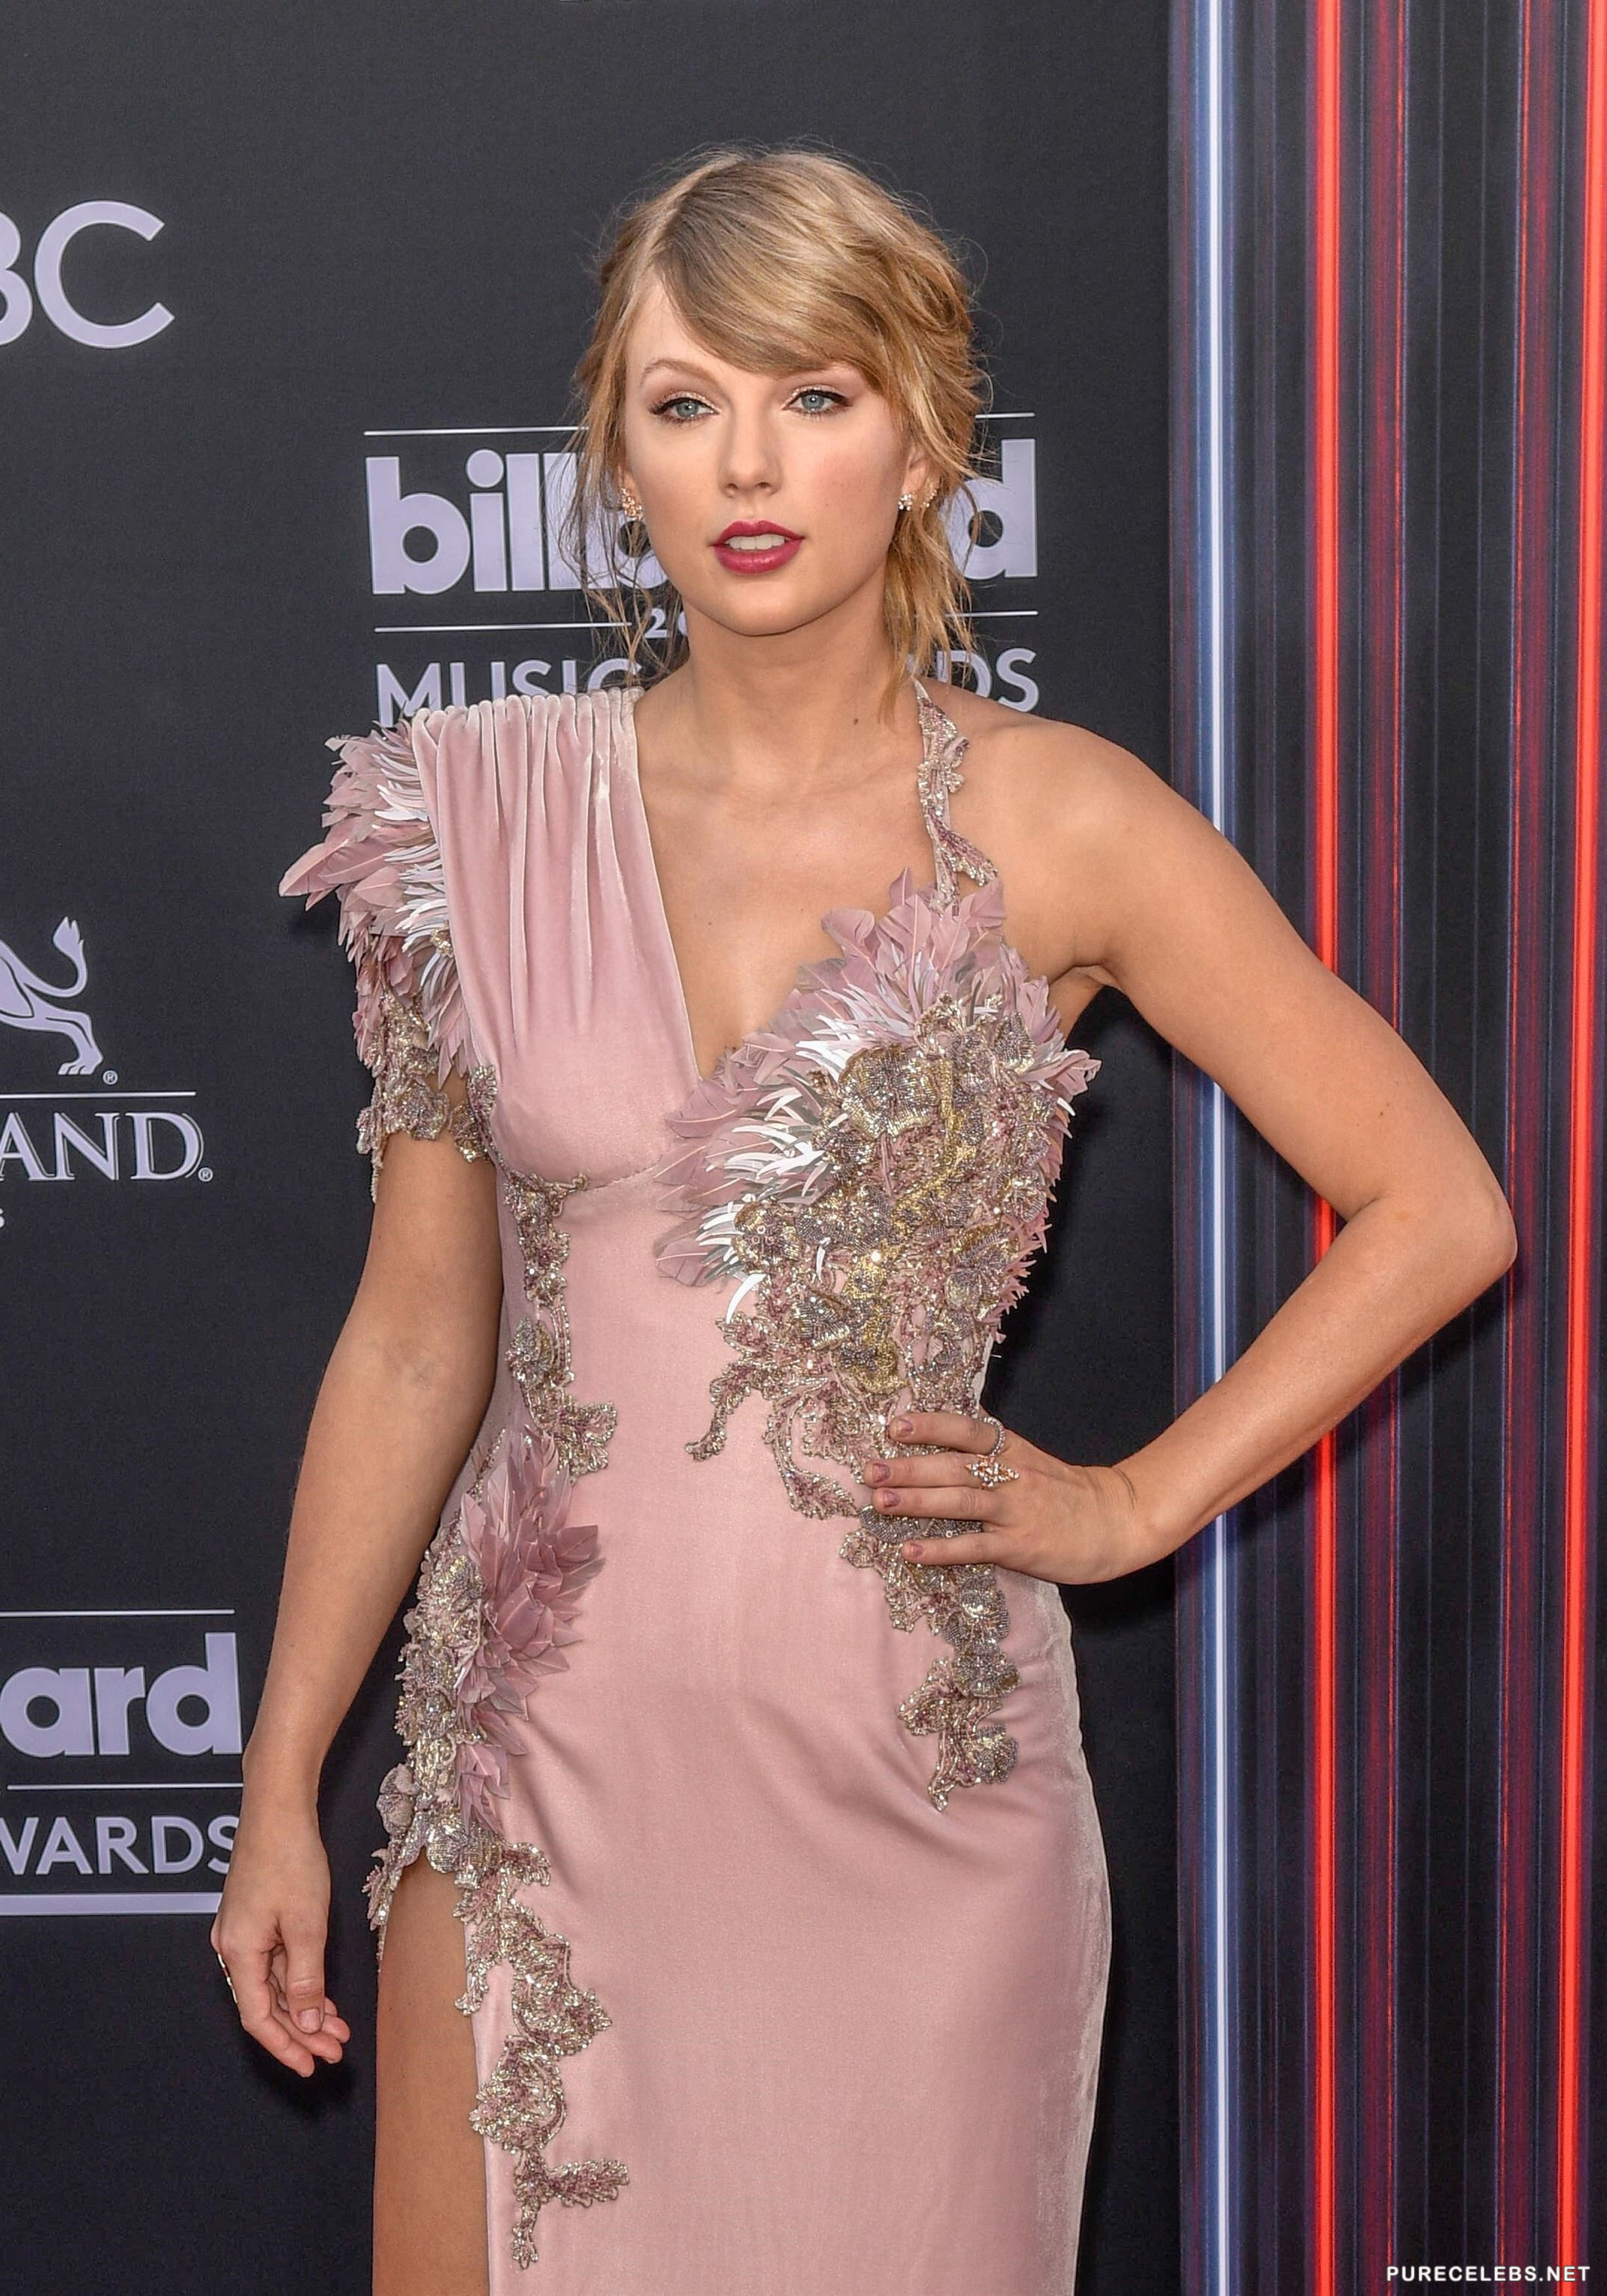 Taylor Swift White Panties Upskirt Moment - NuCelebs.com